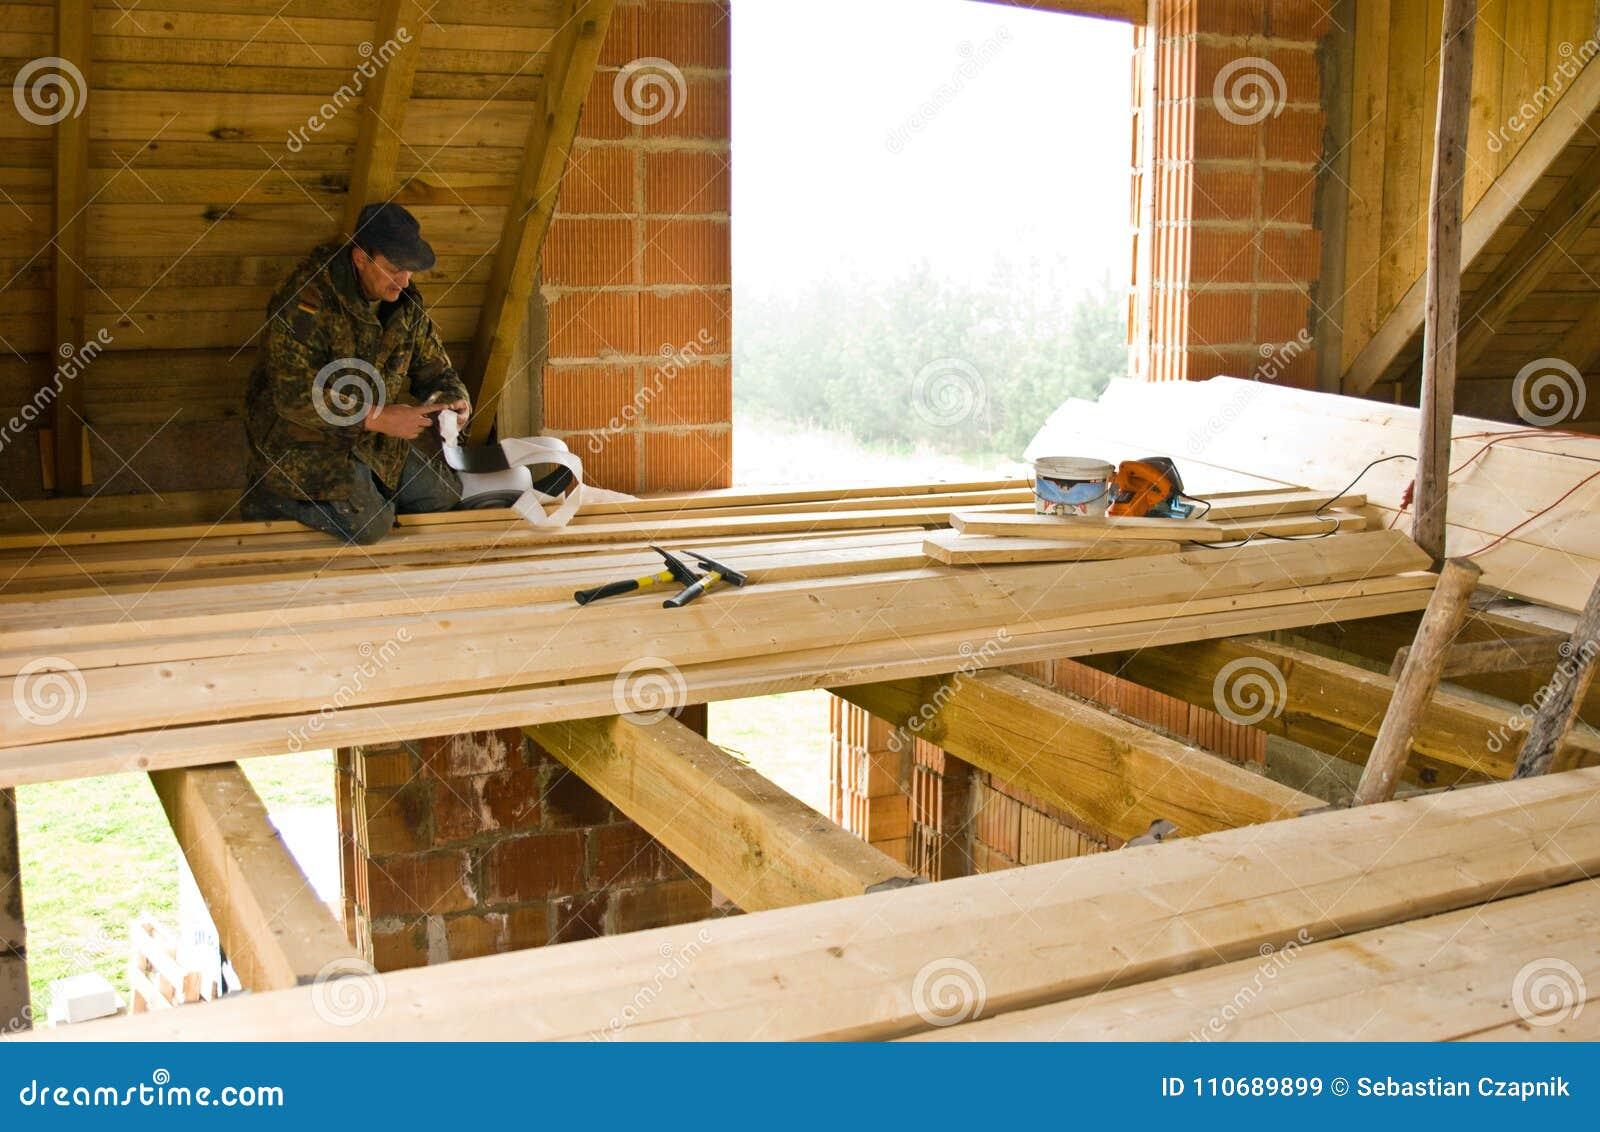 Carpenter building new floor of a loft room